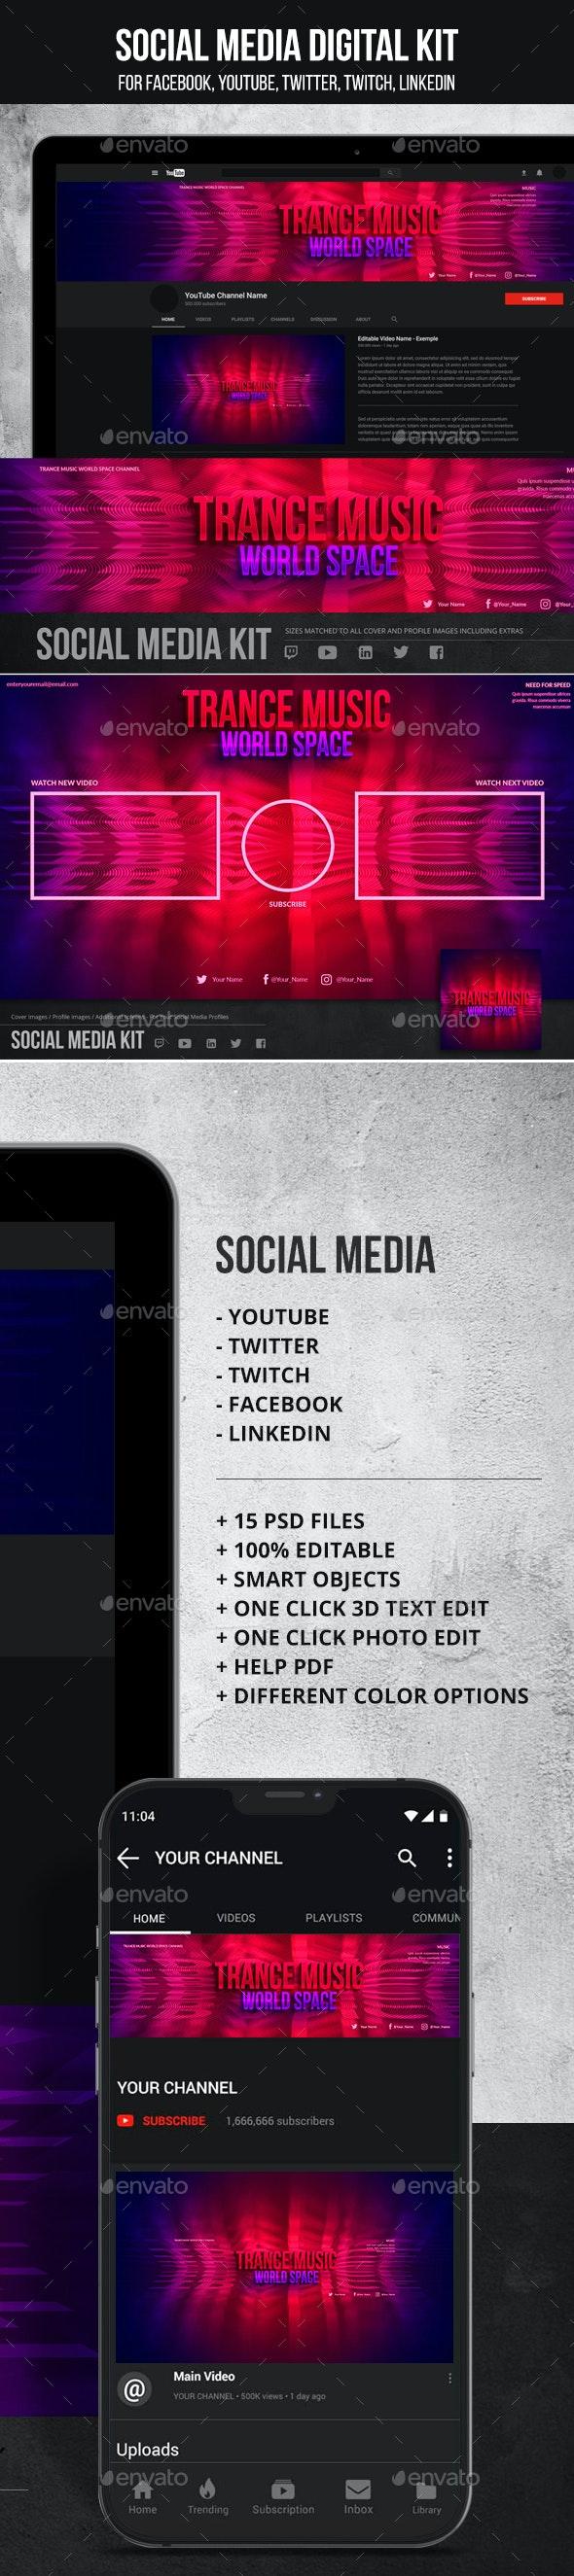 Social Media Profiles - Art Kit - Social Media Web Elements